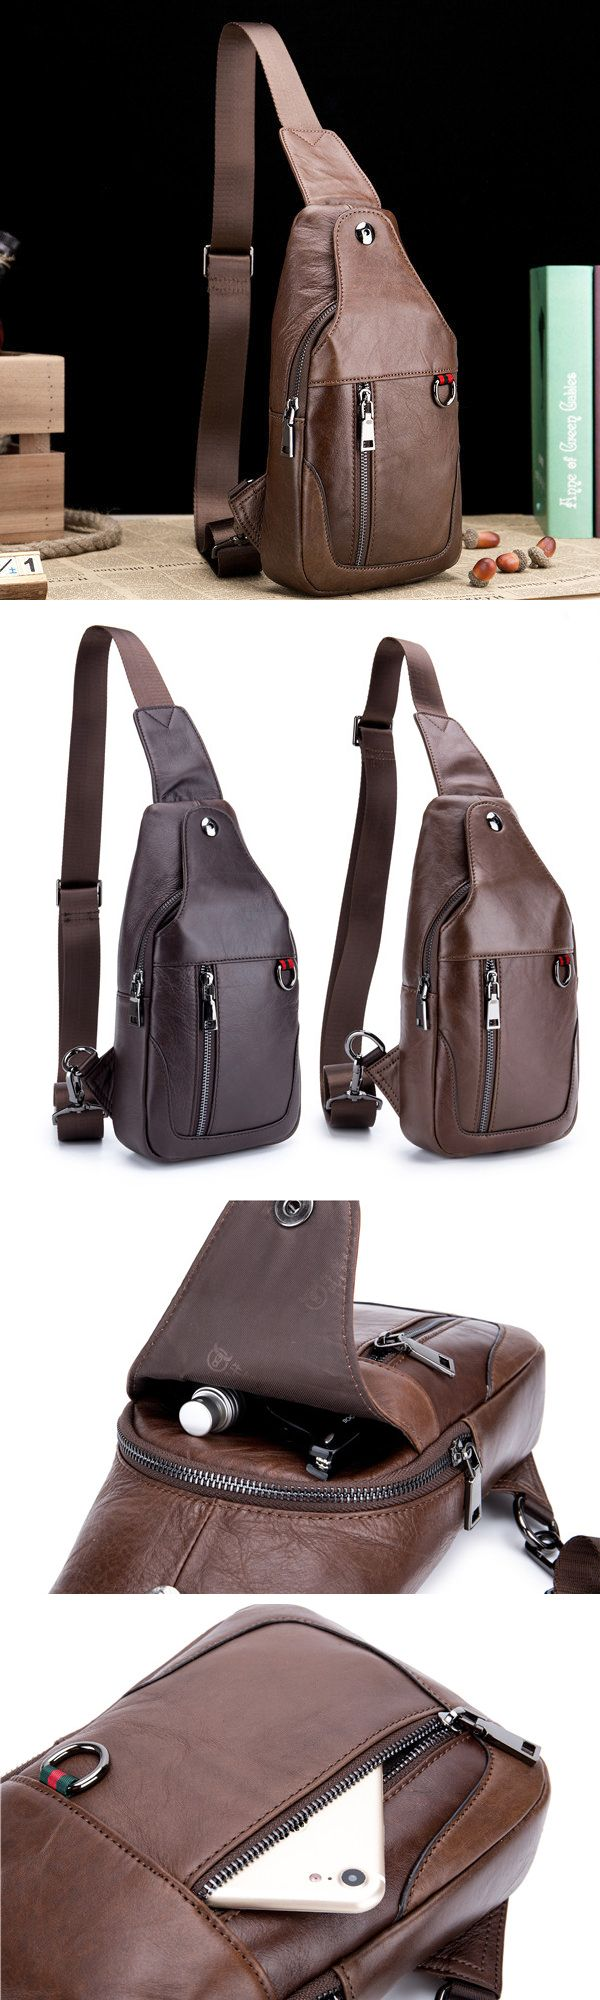 93 best nc men s bags images on pinterest bag men men bags and